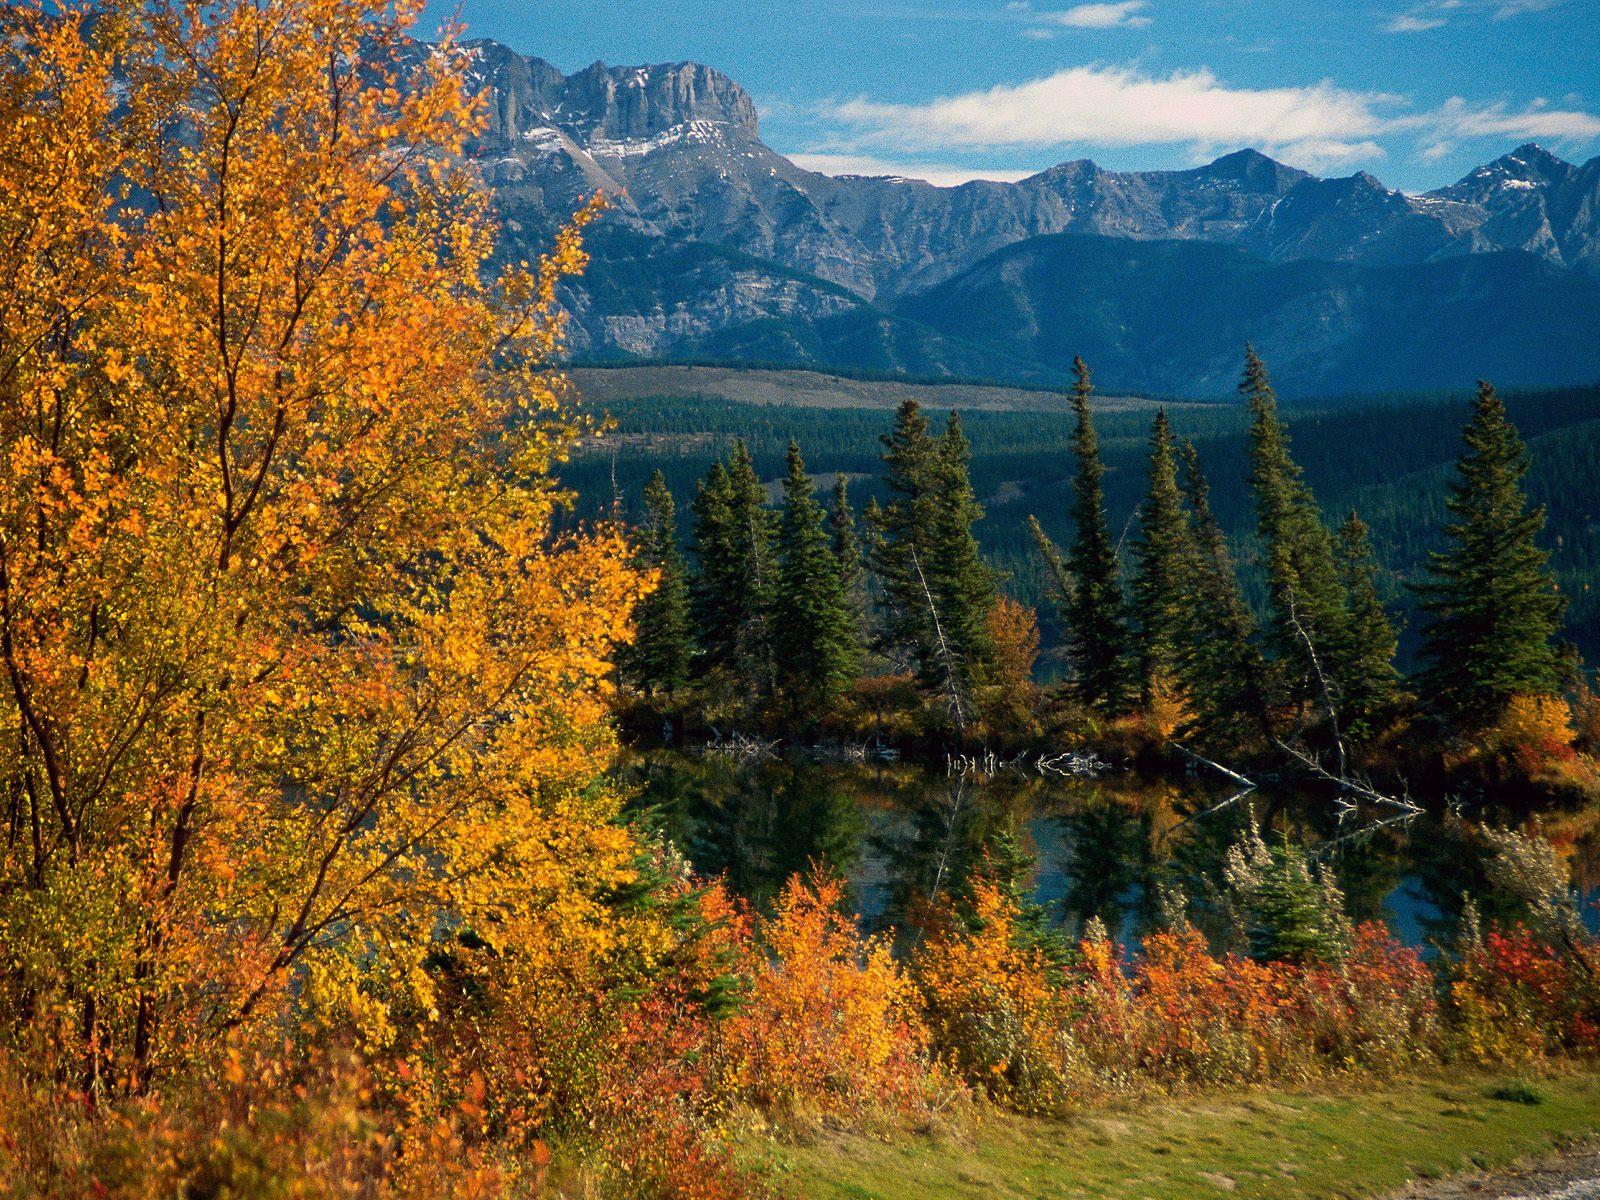 nationalpark alberta kanada - photo #31